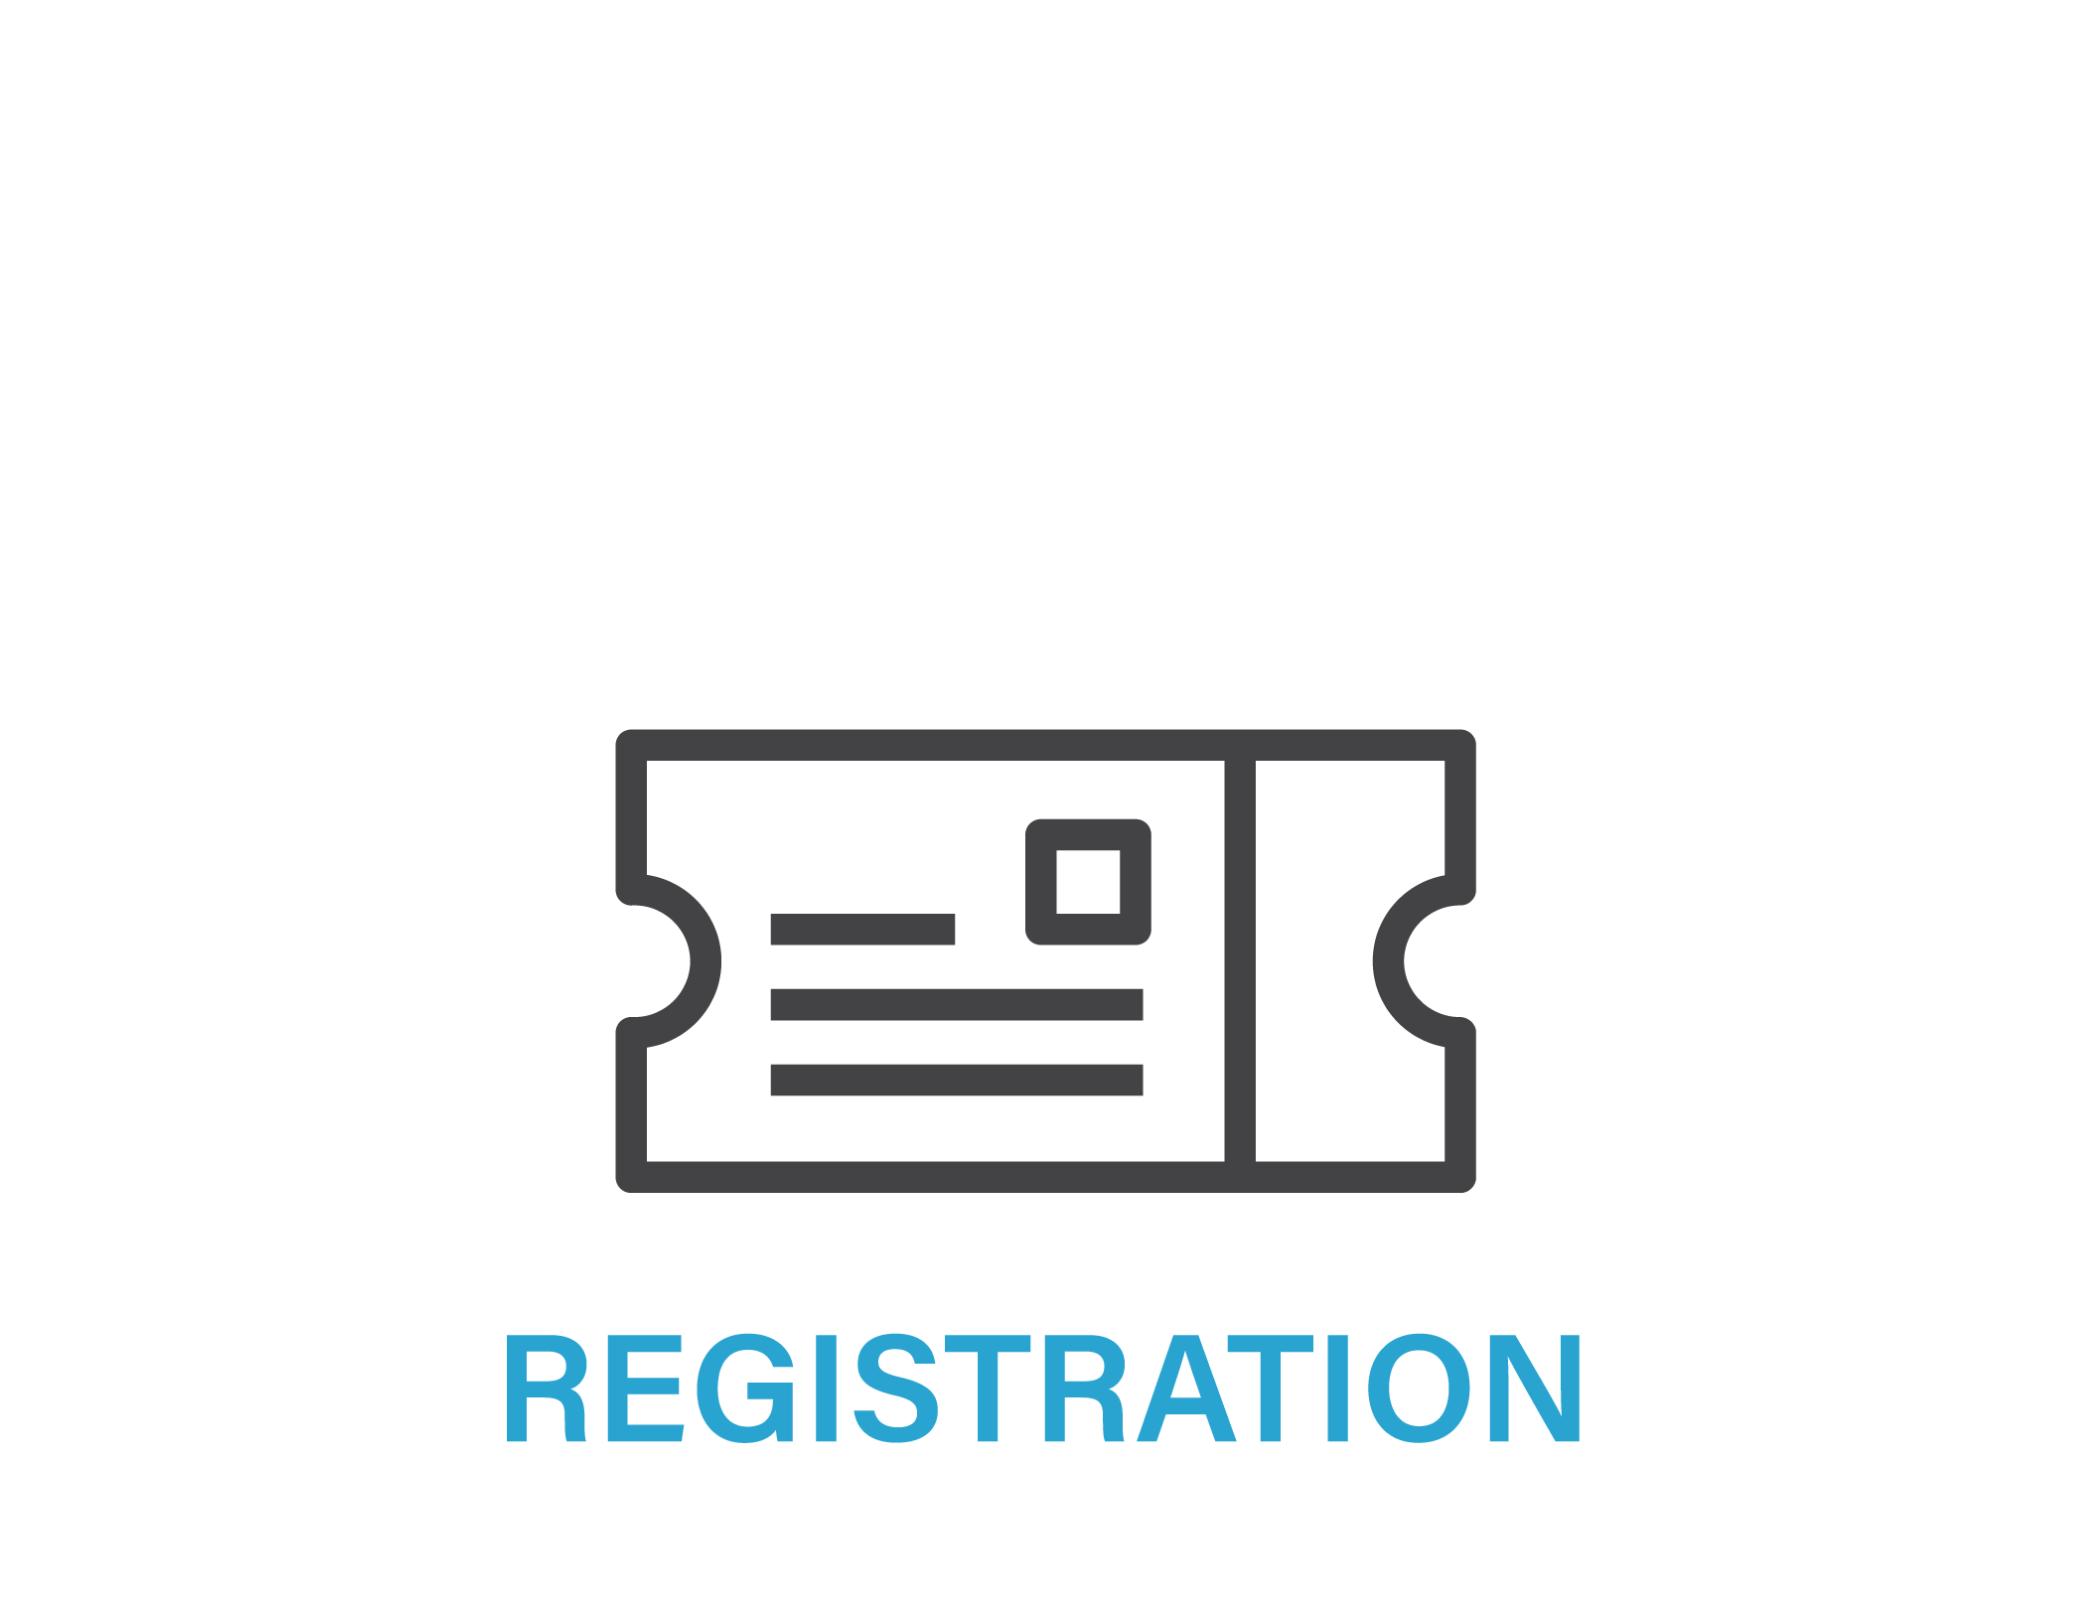 Registration web